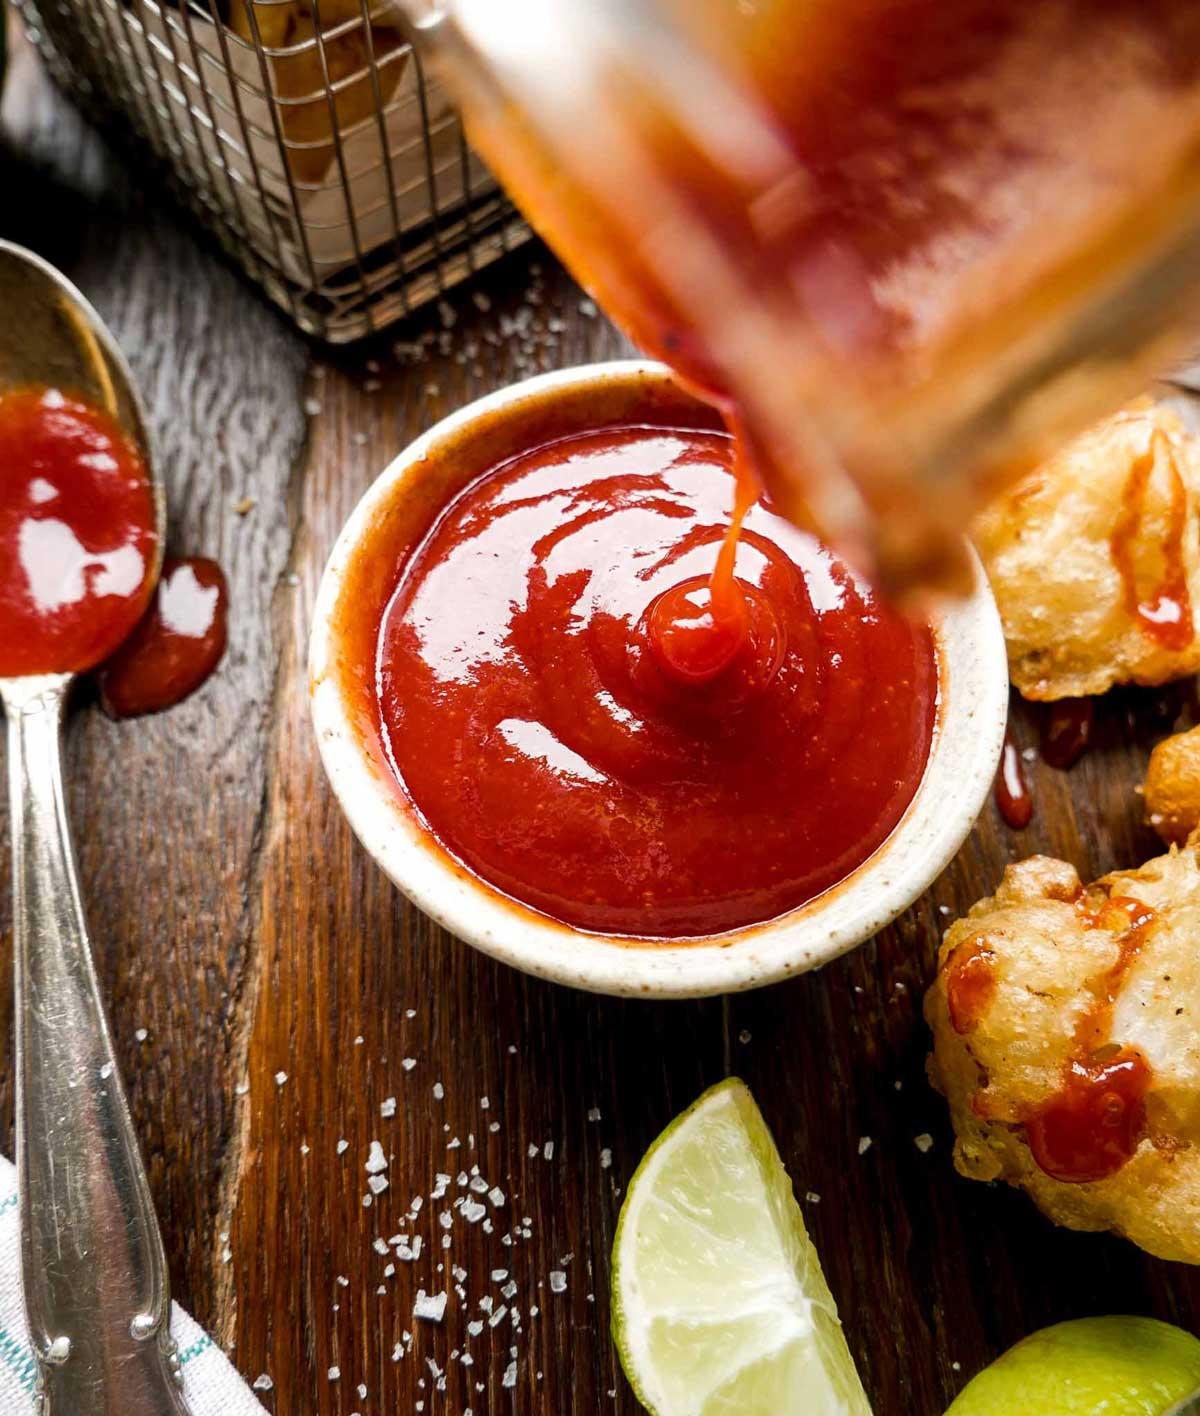 hjemmelavet vegansk ketchup opskrift micadeli